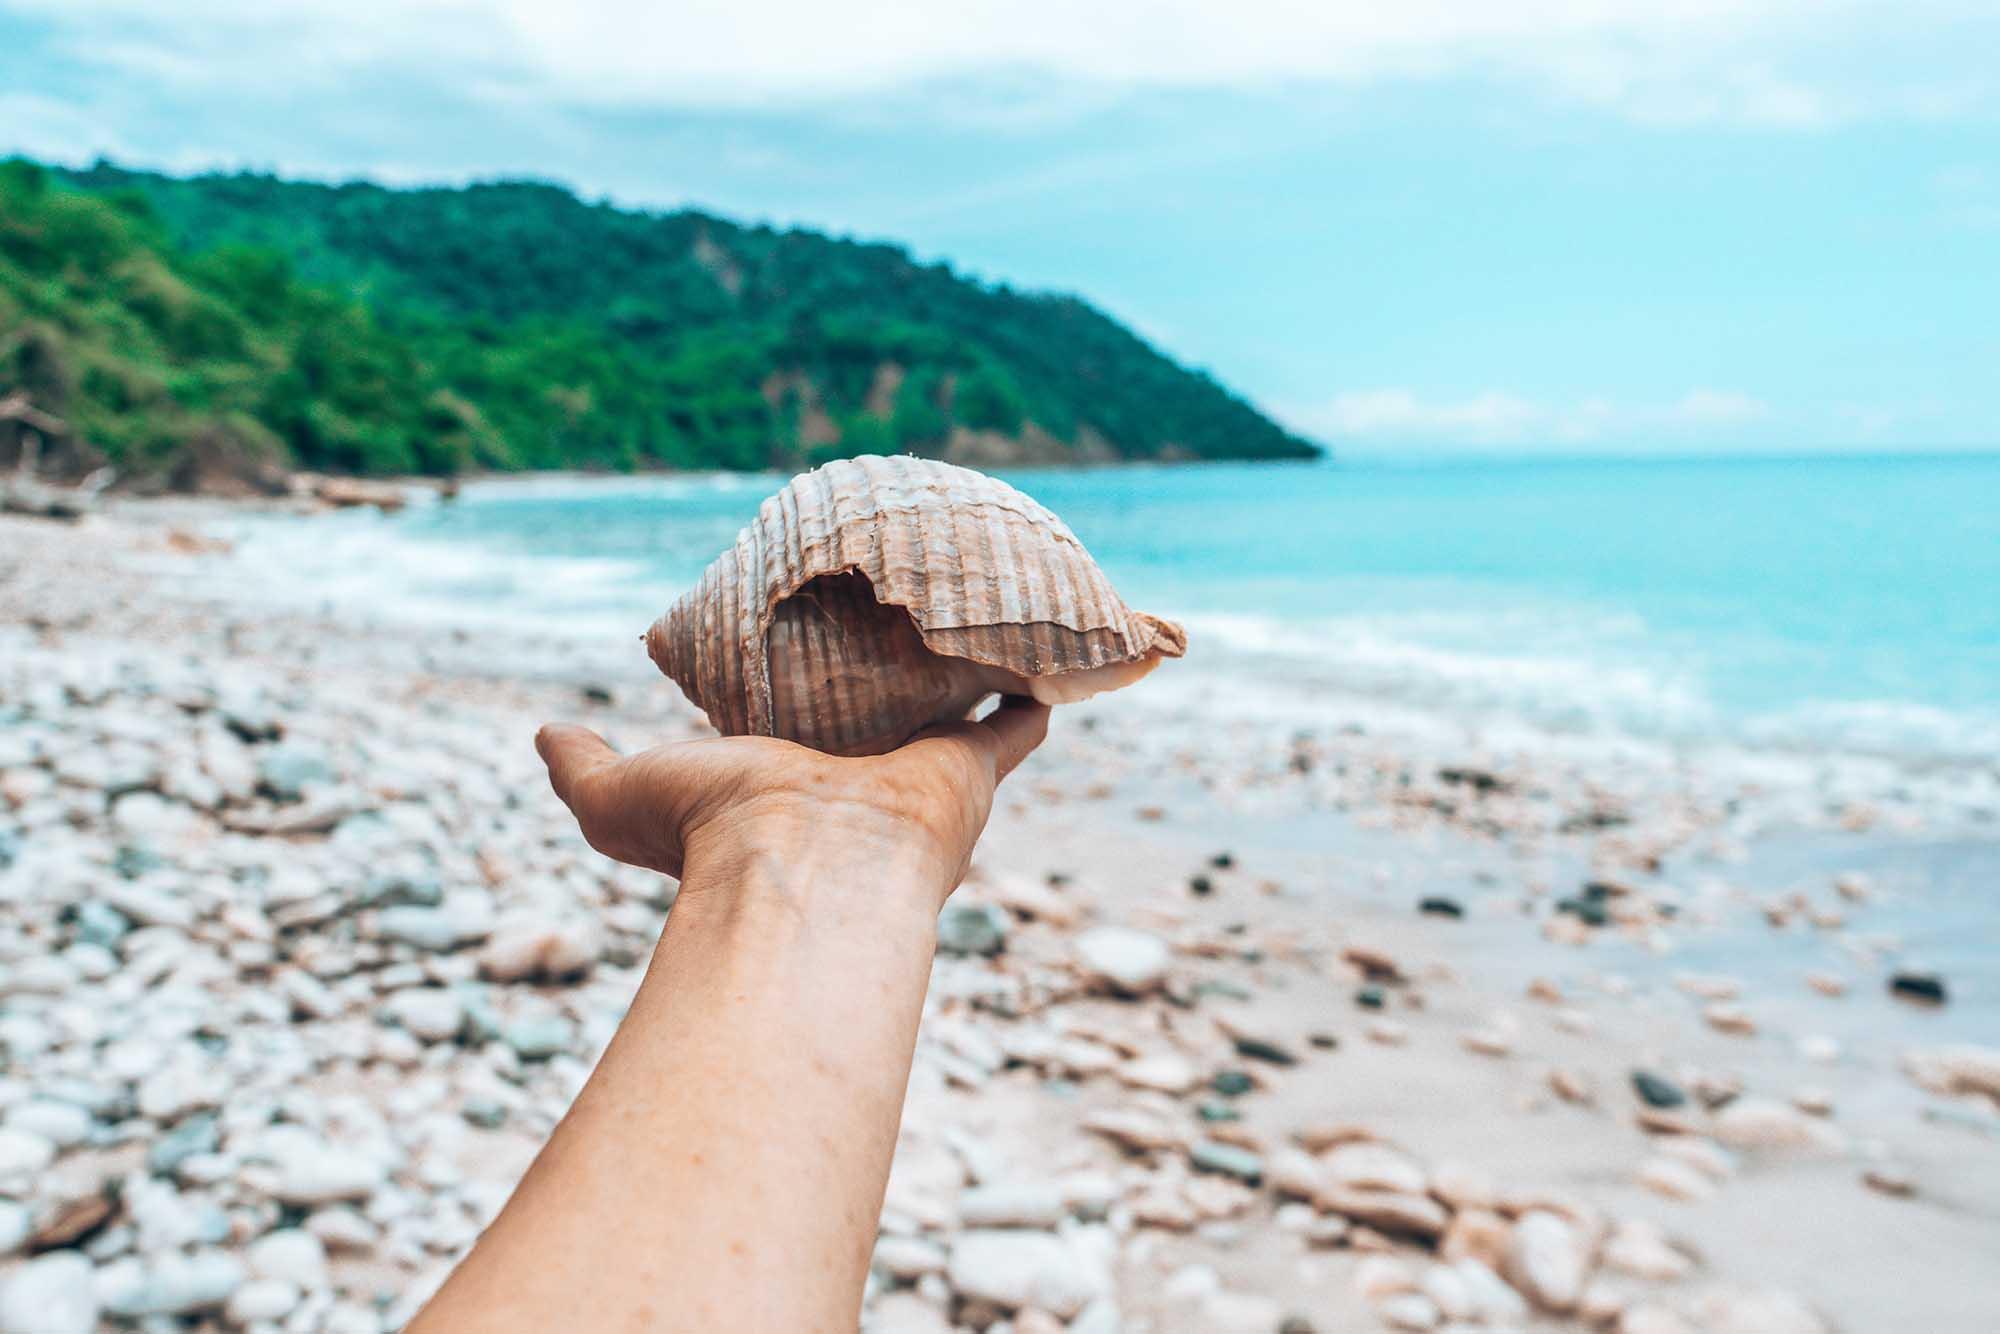 Shell Cabo Blanco Nature Reserve Nicoya Peninsula Costa Rica